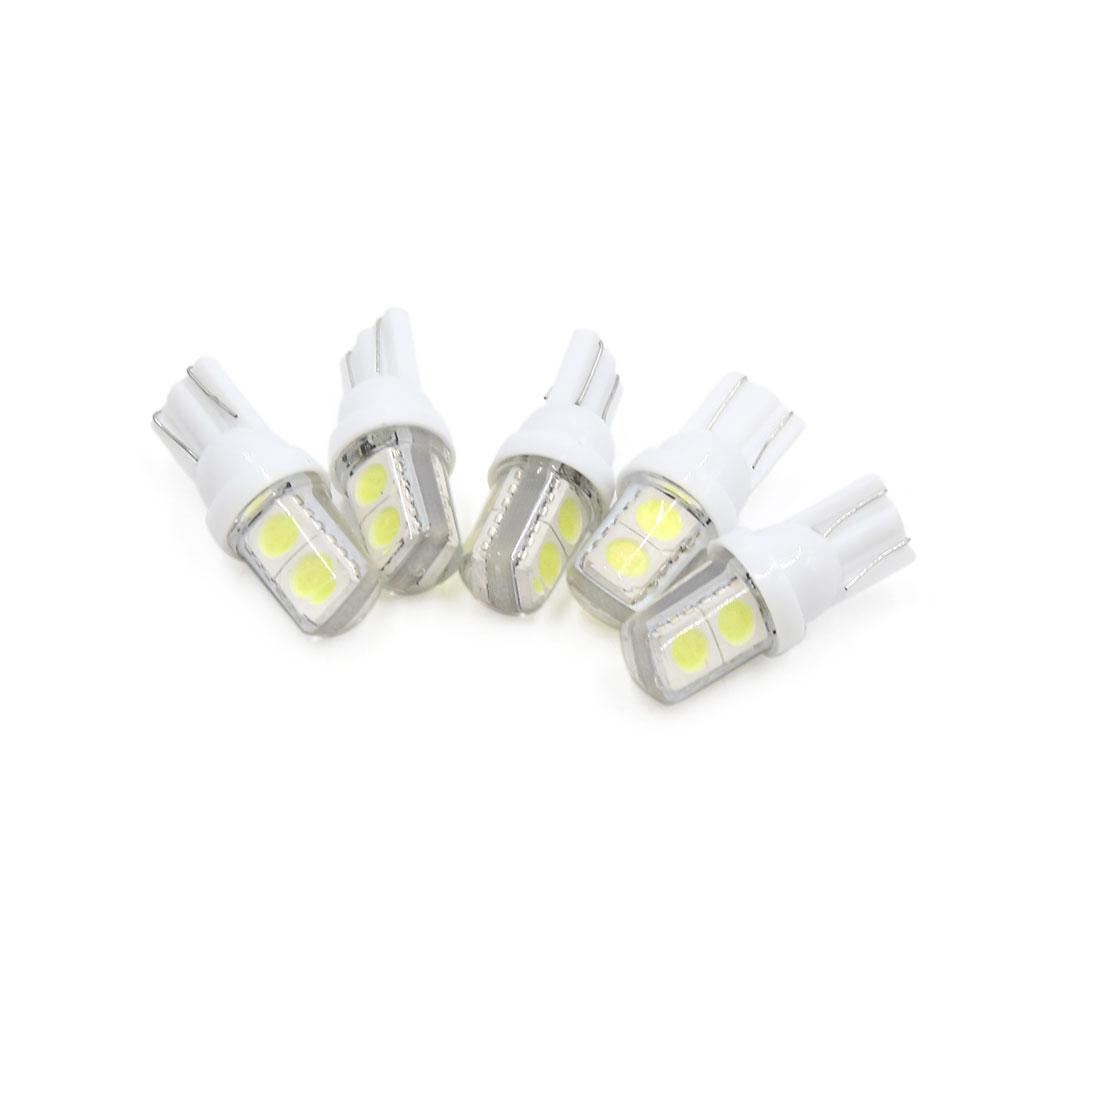 5pcs Silicone Shell T10 White 4 5050-SMD LED Car Interior Panel Light Lamp Bulb